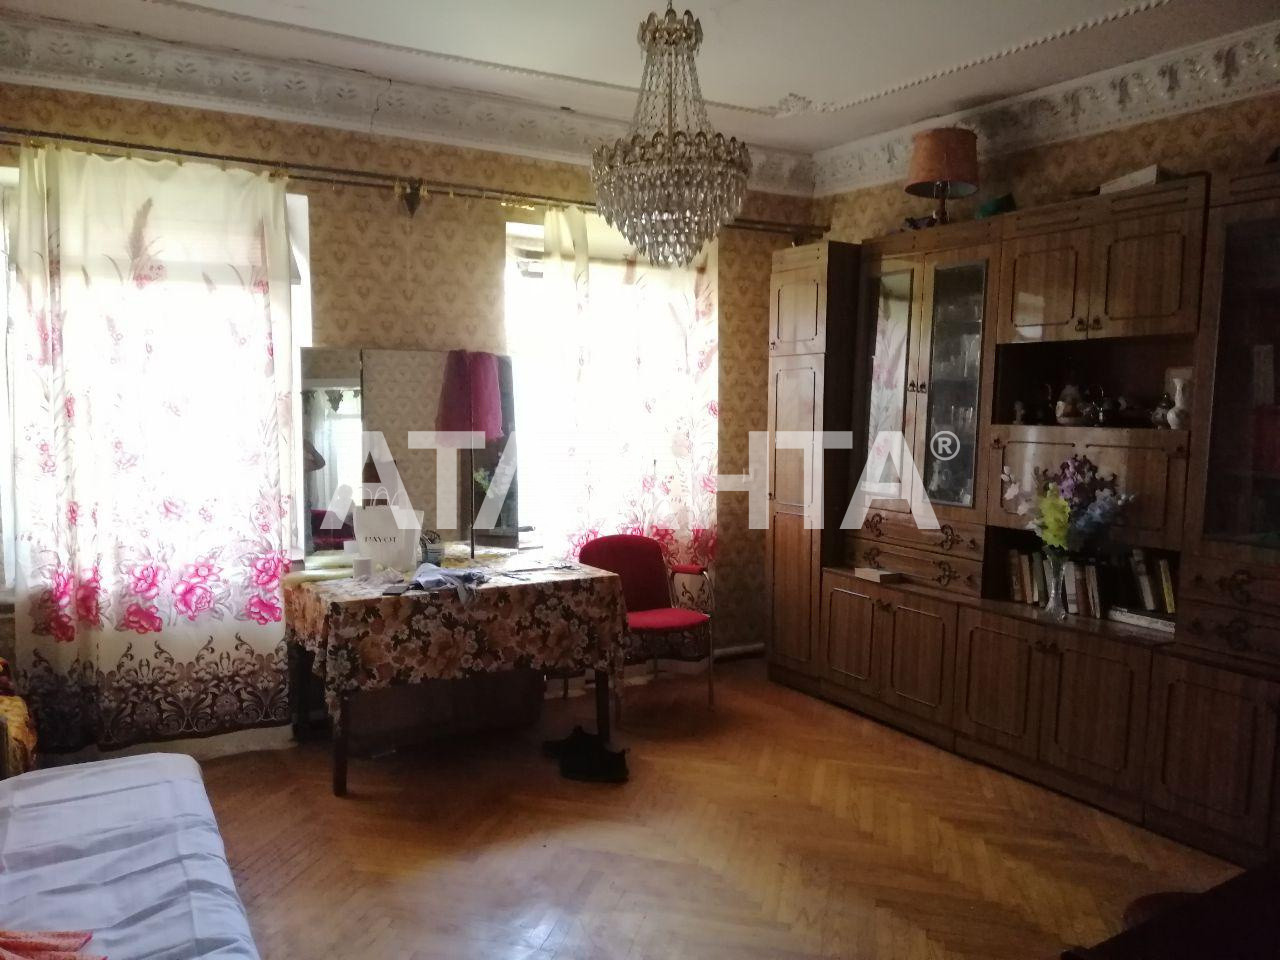 Продается Дом на ул. Никитина — 40 000 у.е. (фото №2)